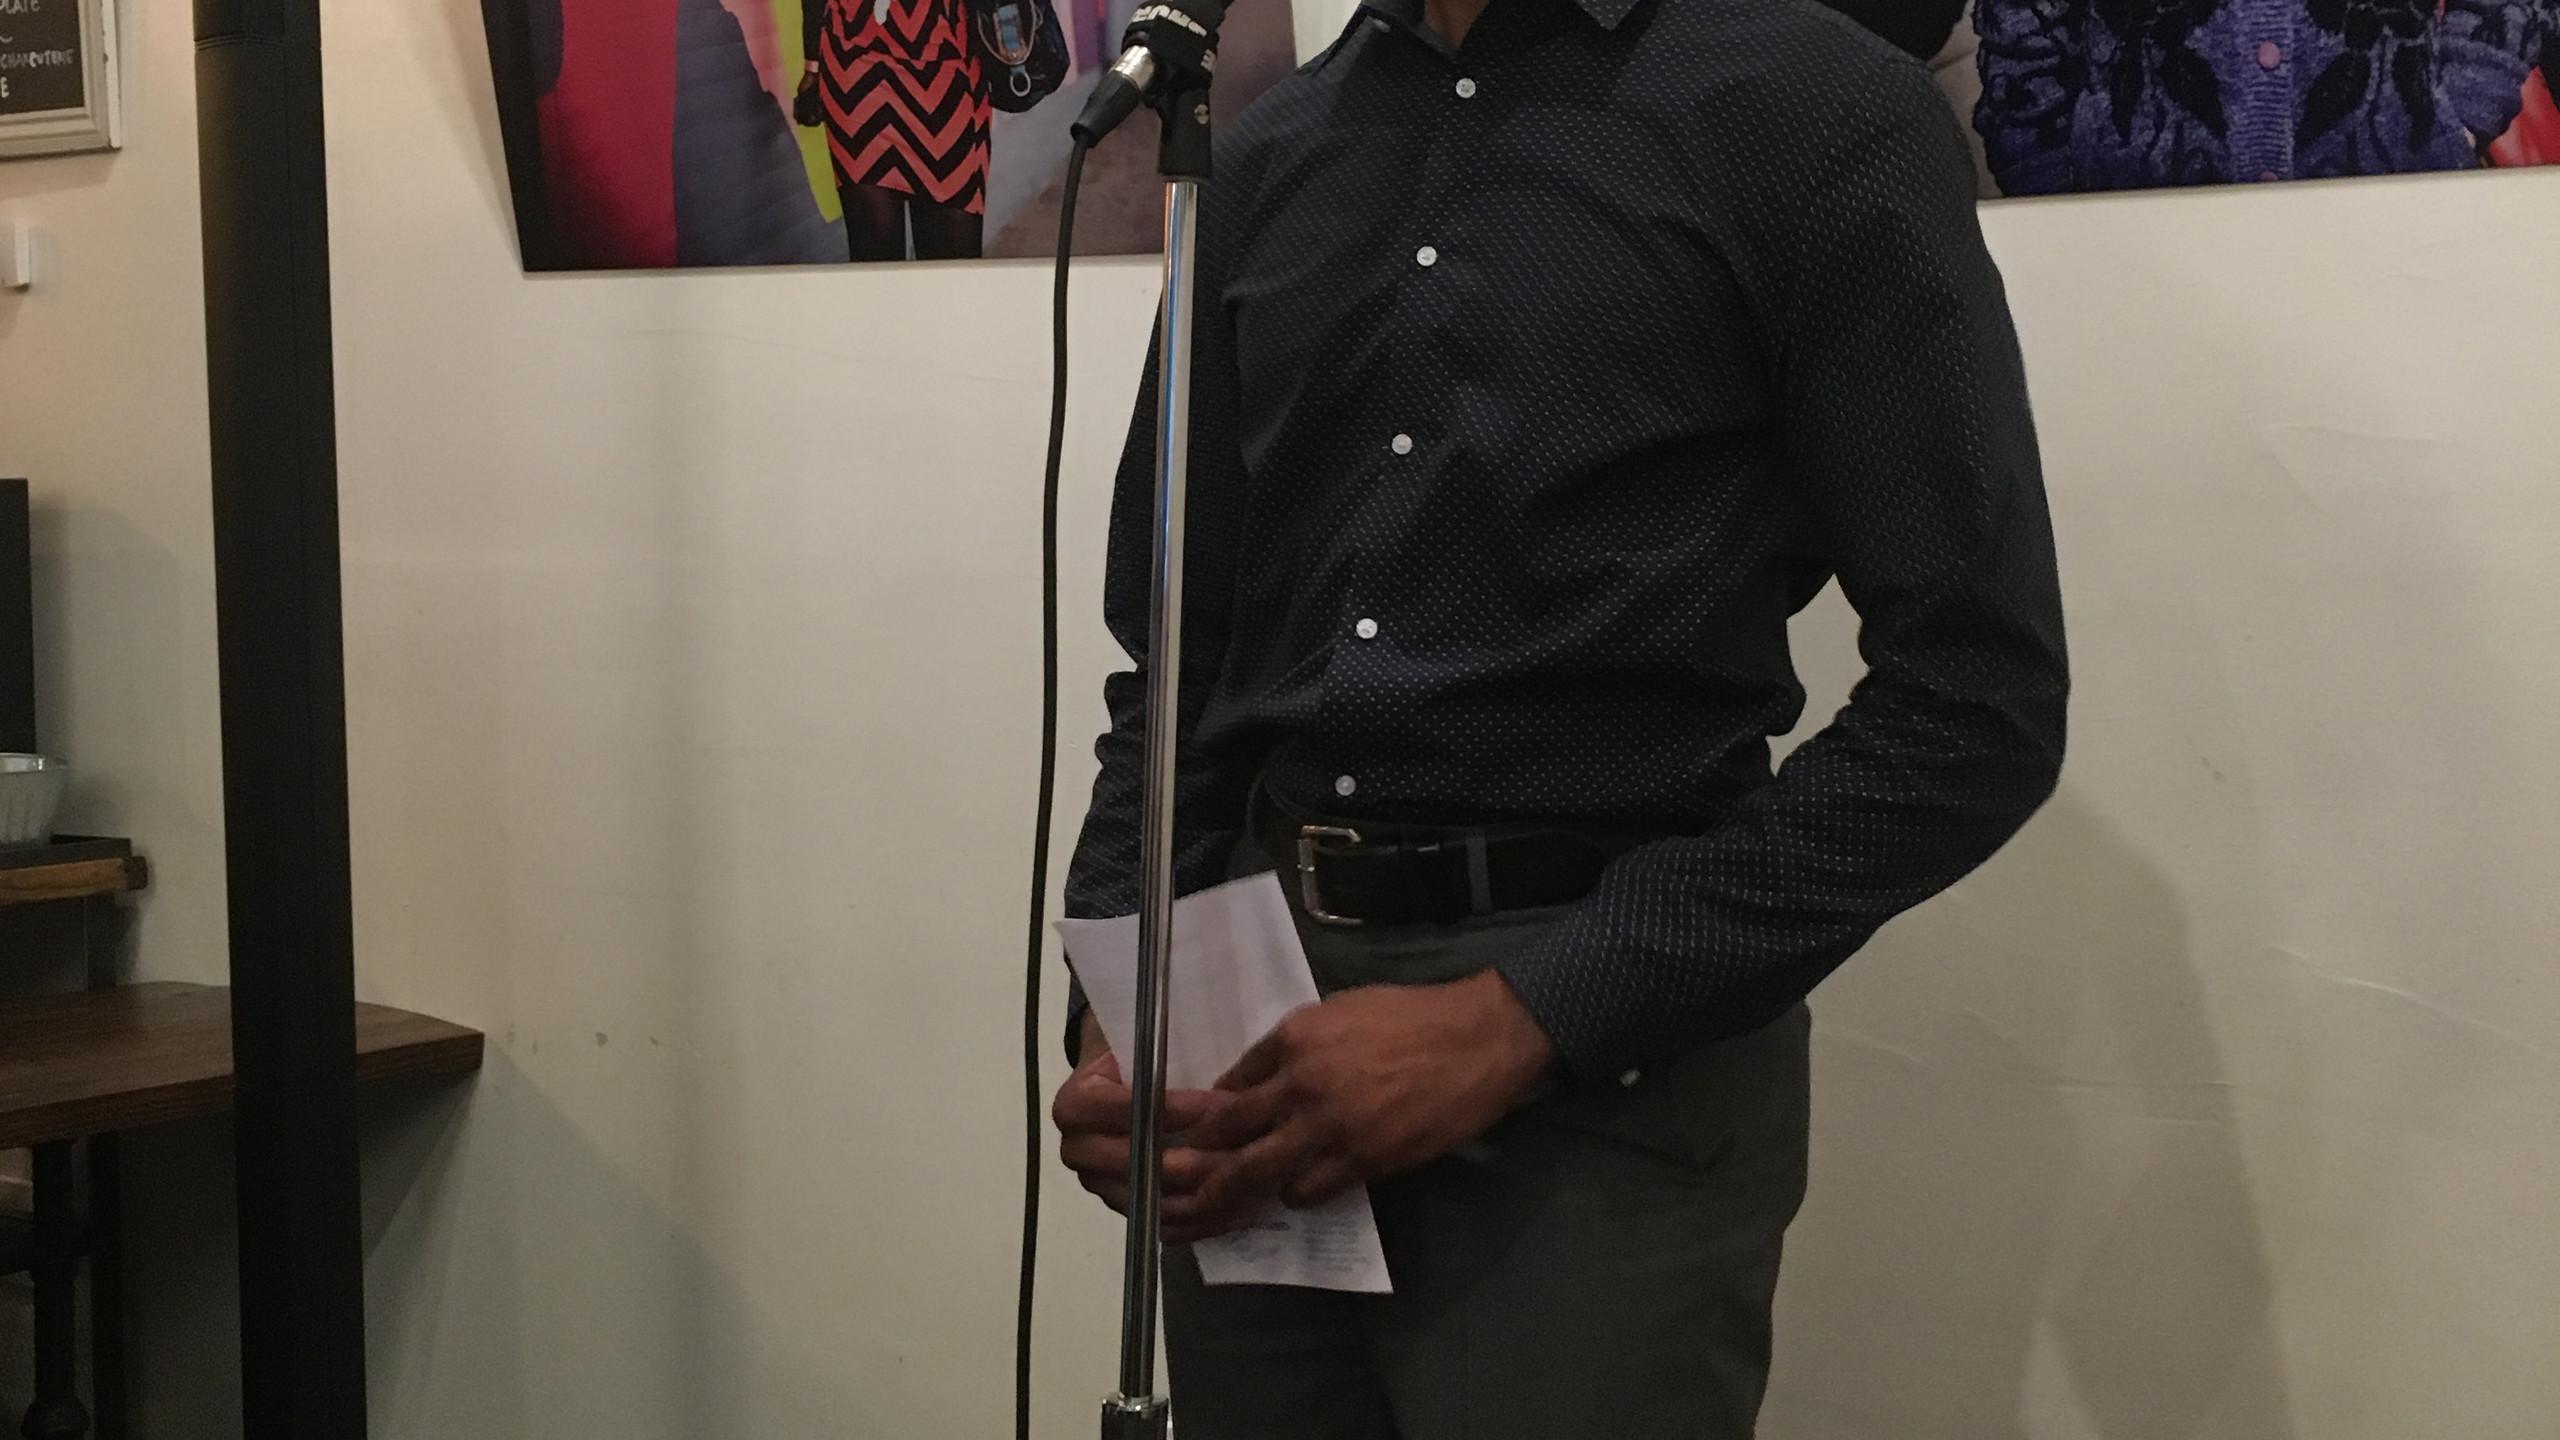 Emcee Joe Okonkwo